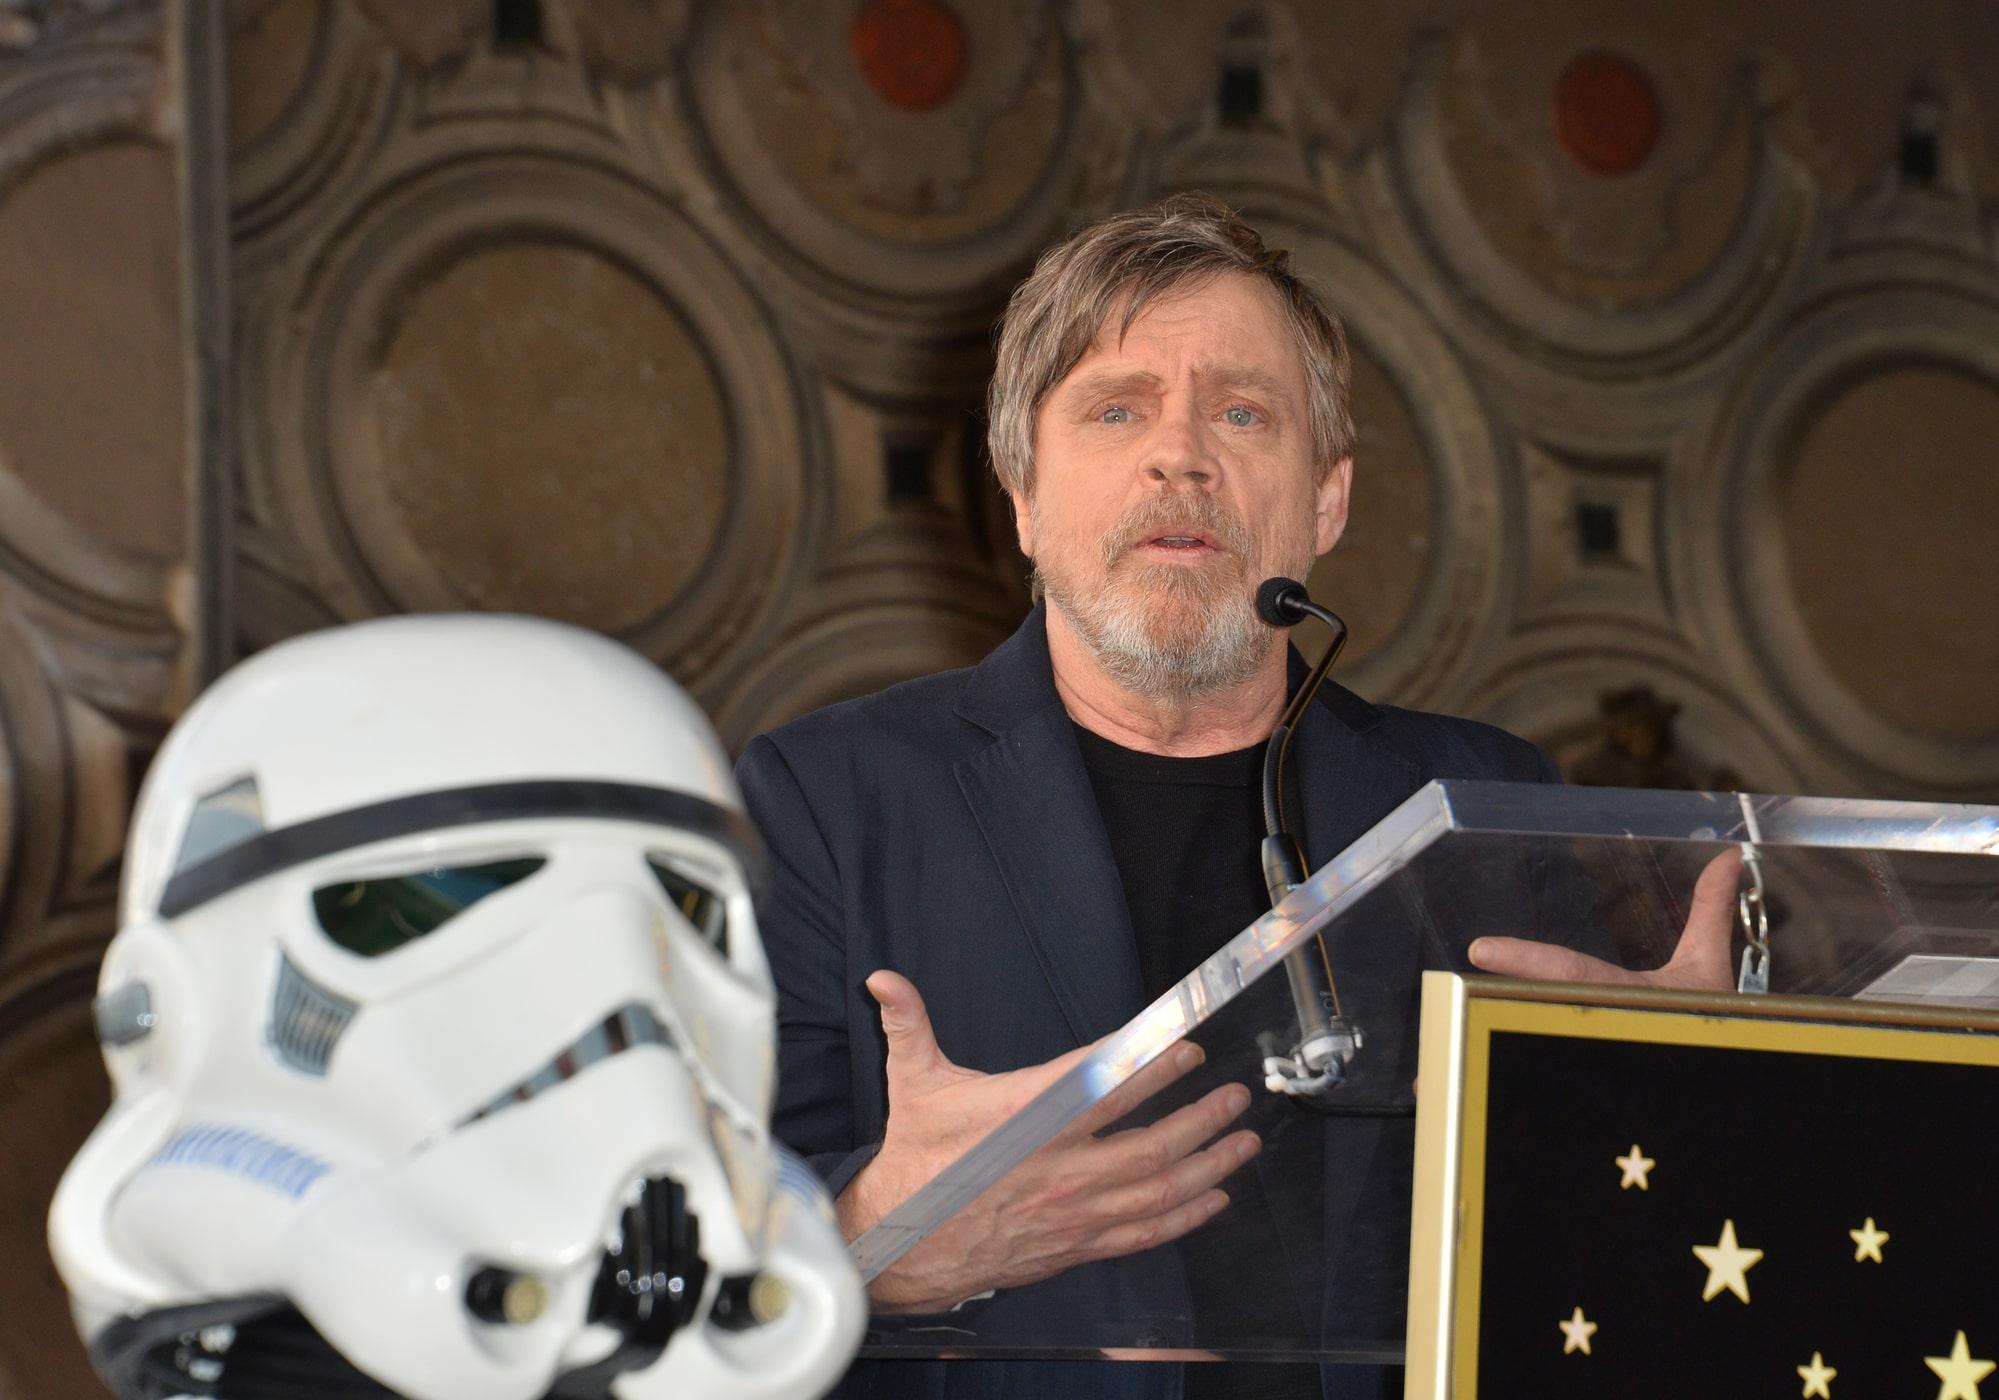 Марк Хэмилл вспомнил забавный случай со съемок «Звездных войн» с Кэрри Фишер